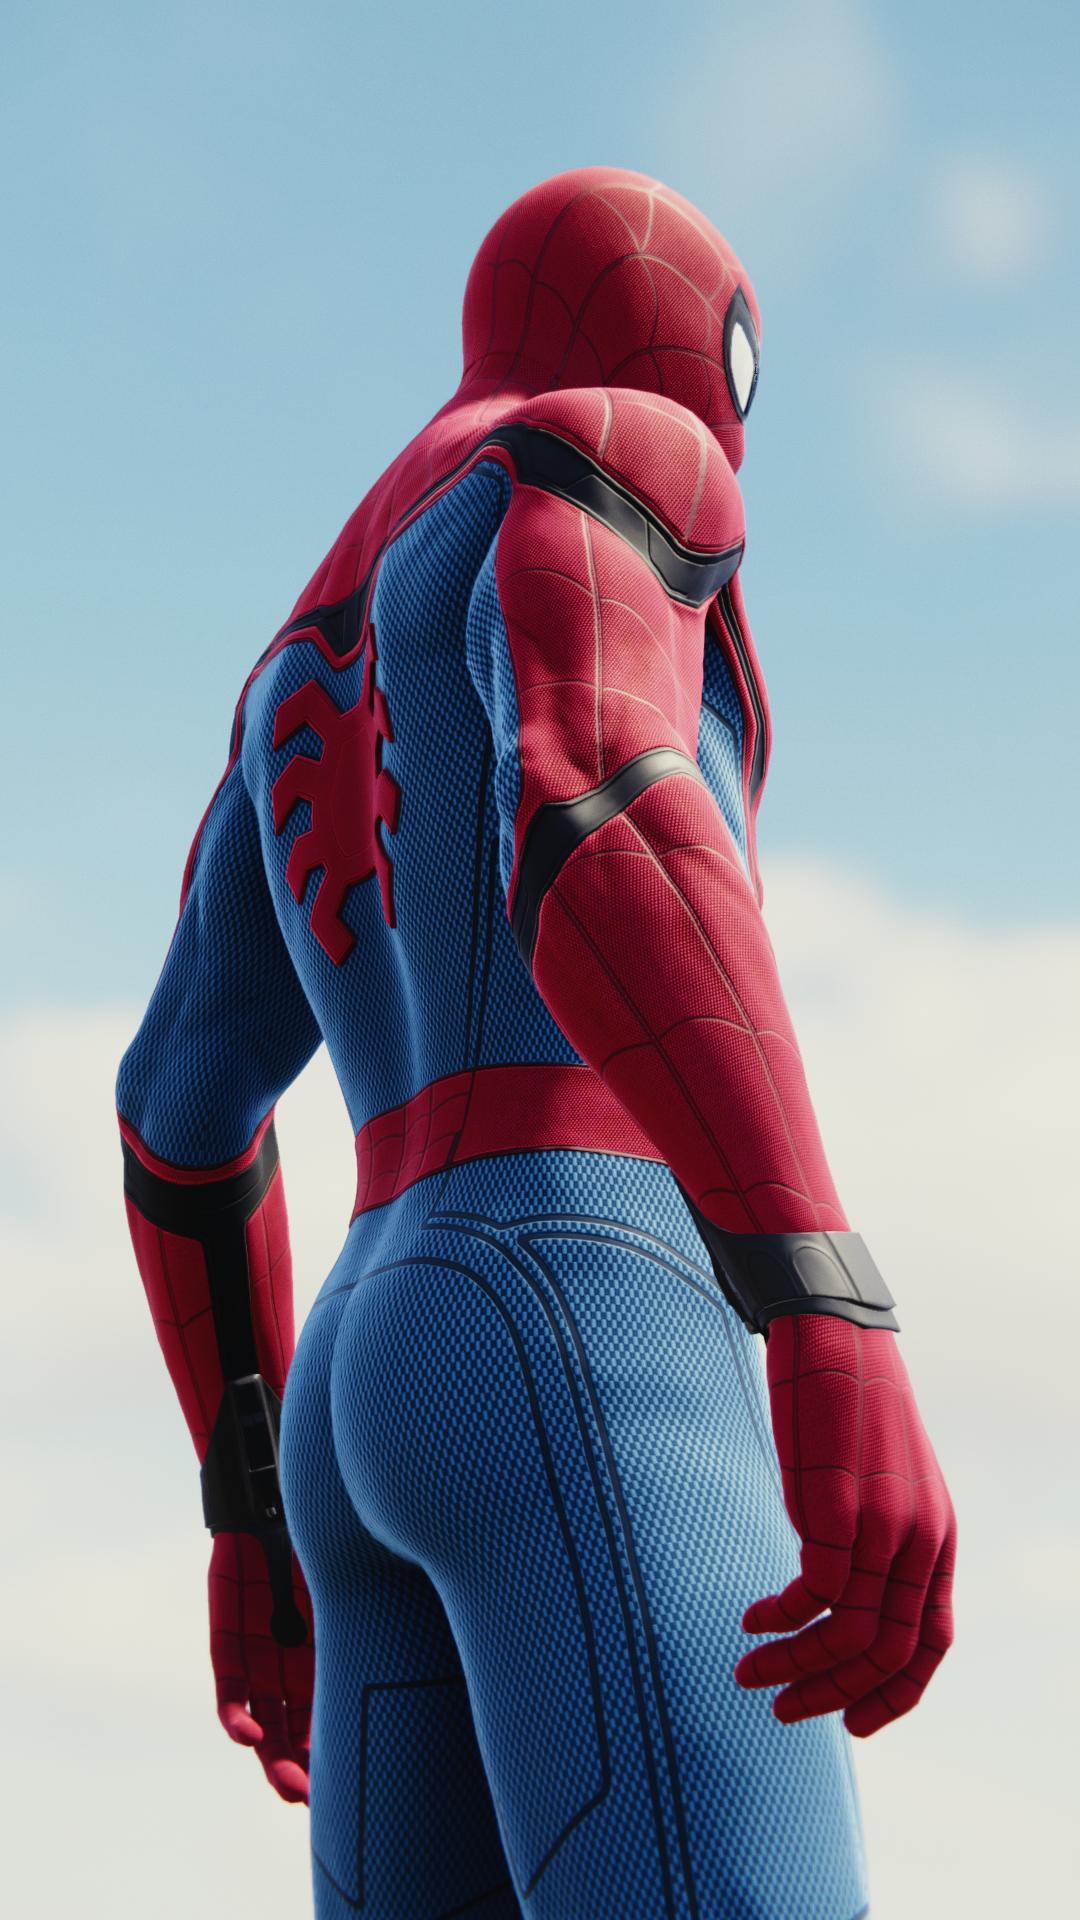 Spiderman  SpidermanPS4  MarvelsSpiderman  Marvel  Sony  Comics   PeterParker  Avengers 664dcd5753246